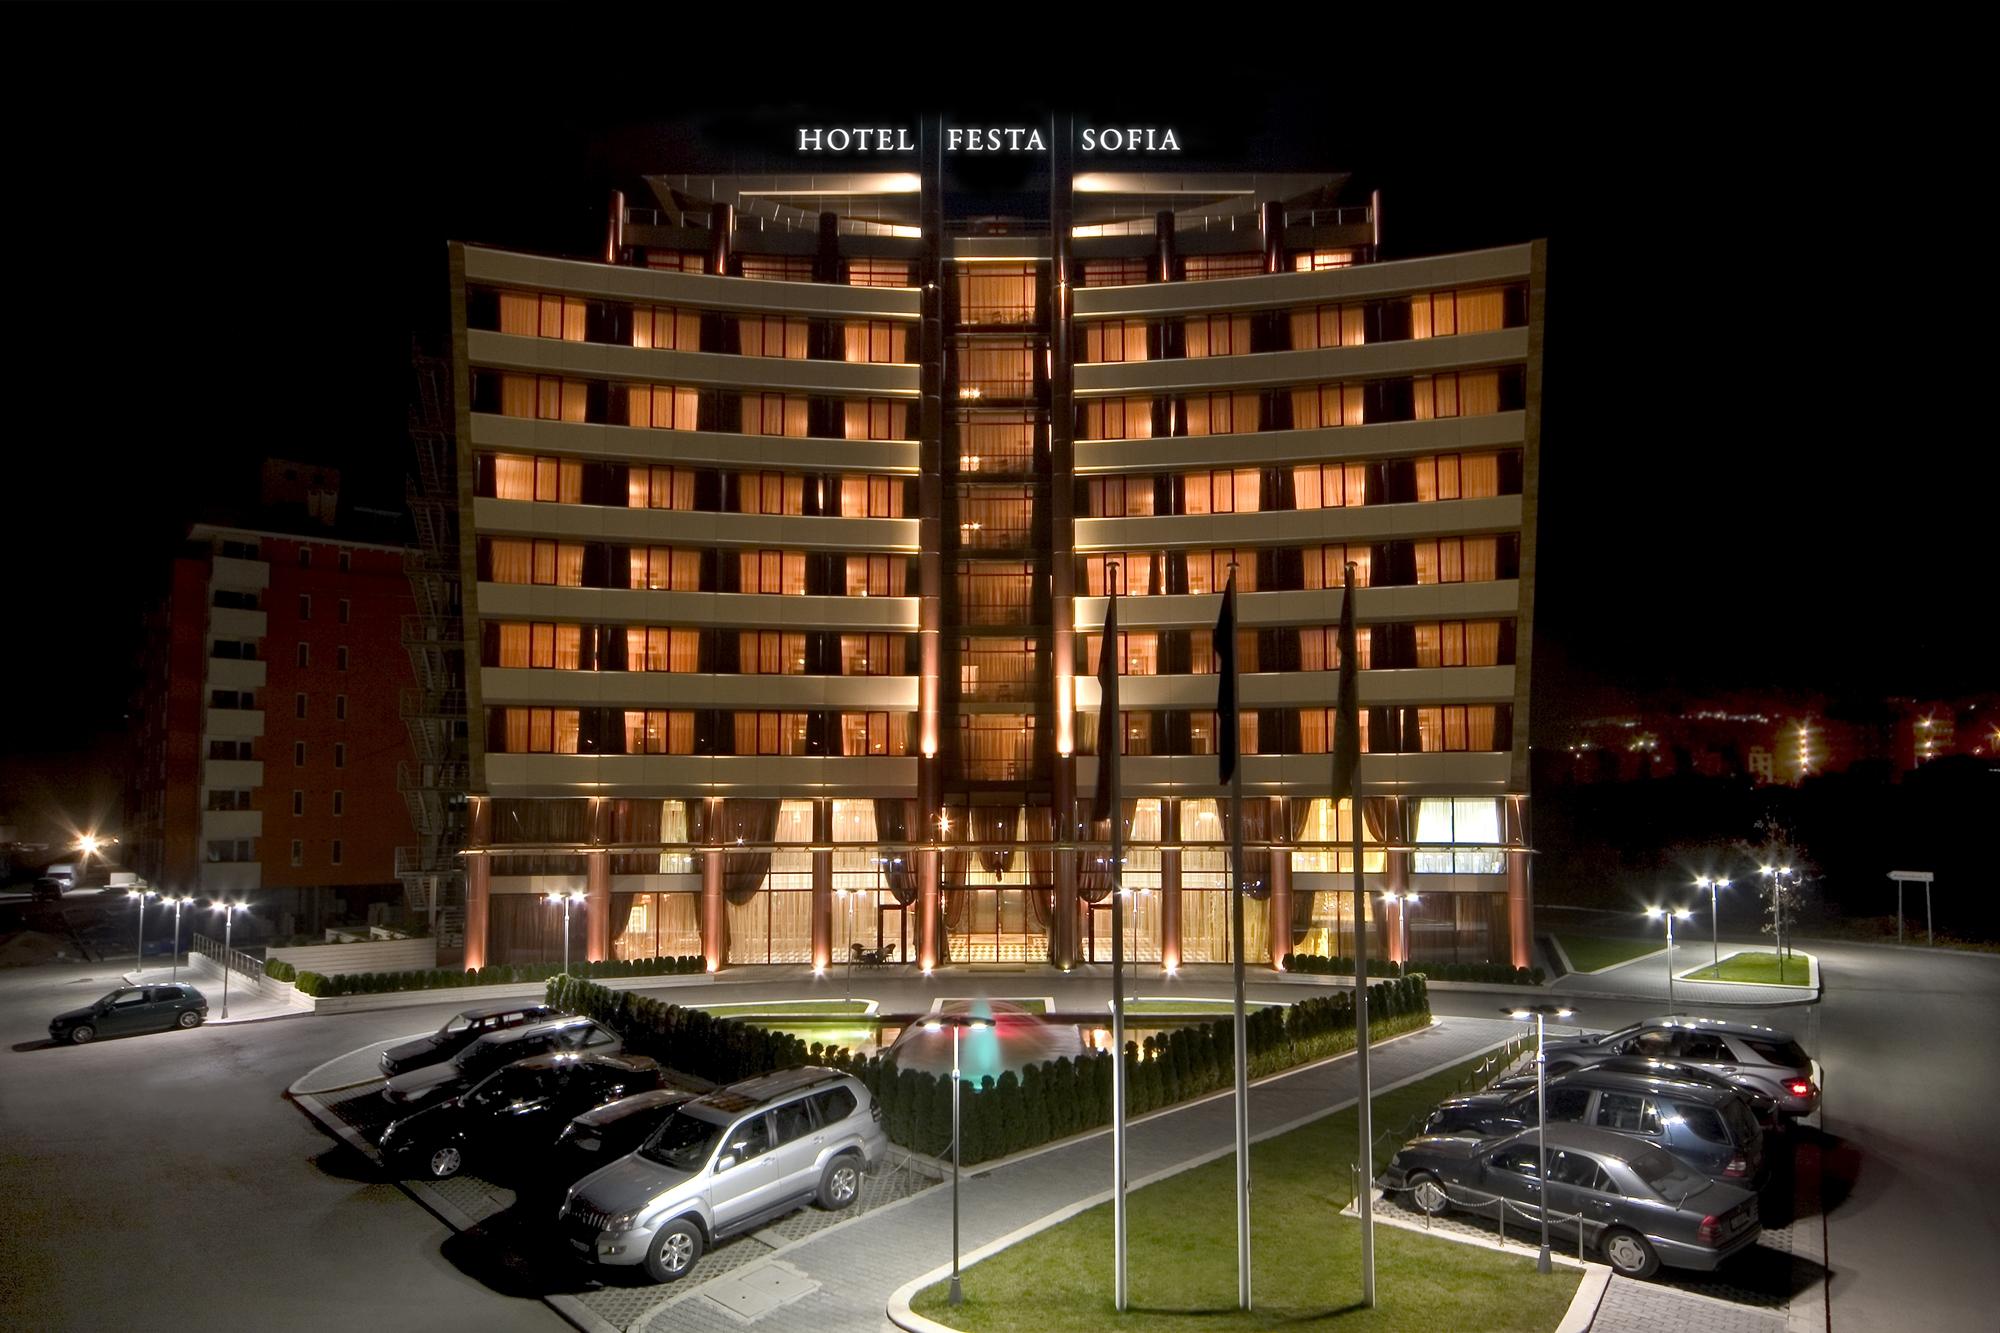 Хотел Феста София, 4*